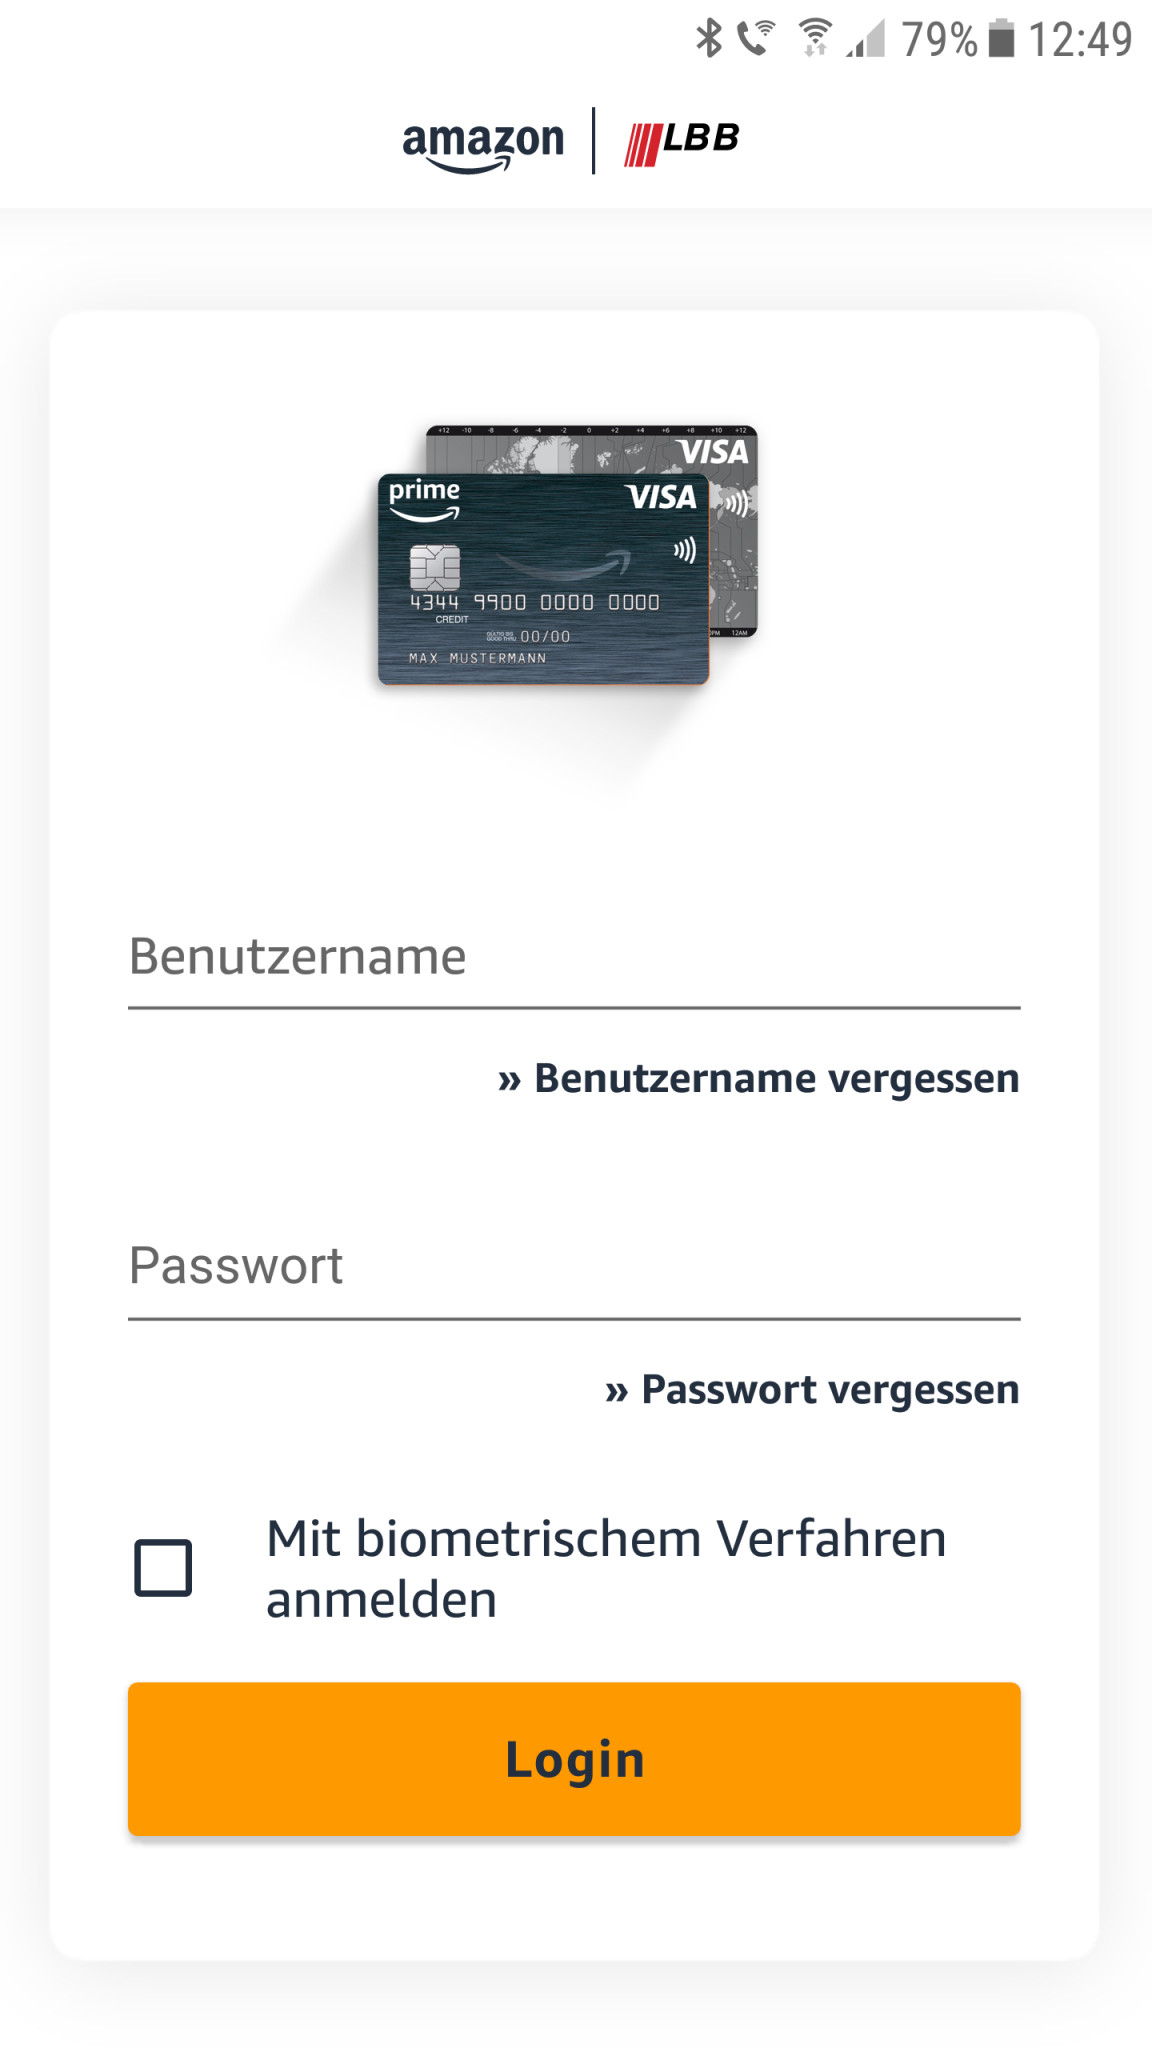 Screenshot 1 - Amazon.de Visa Karte (Android-App)